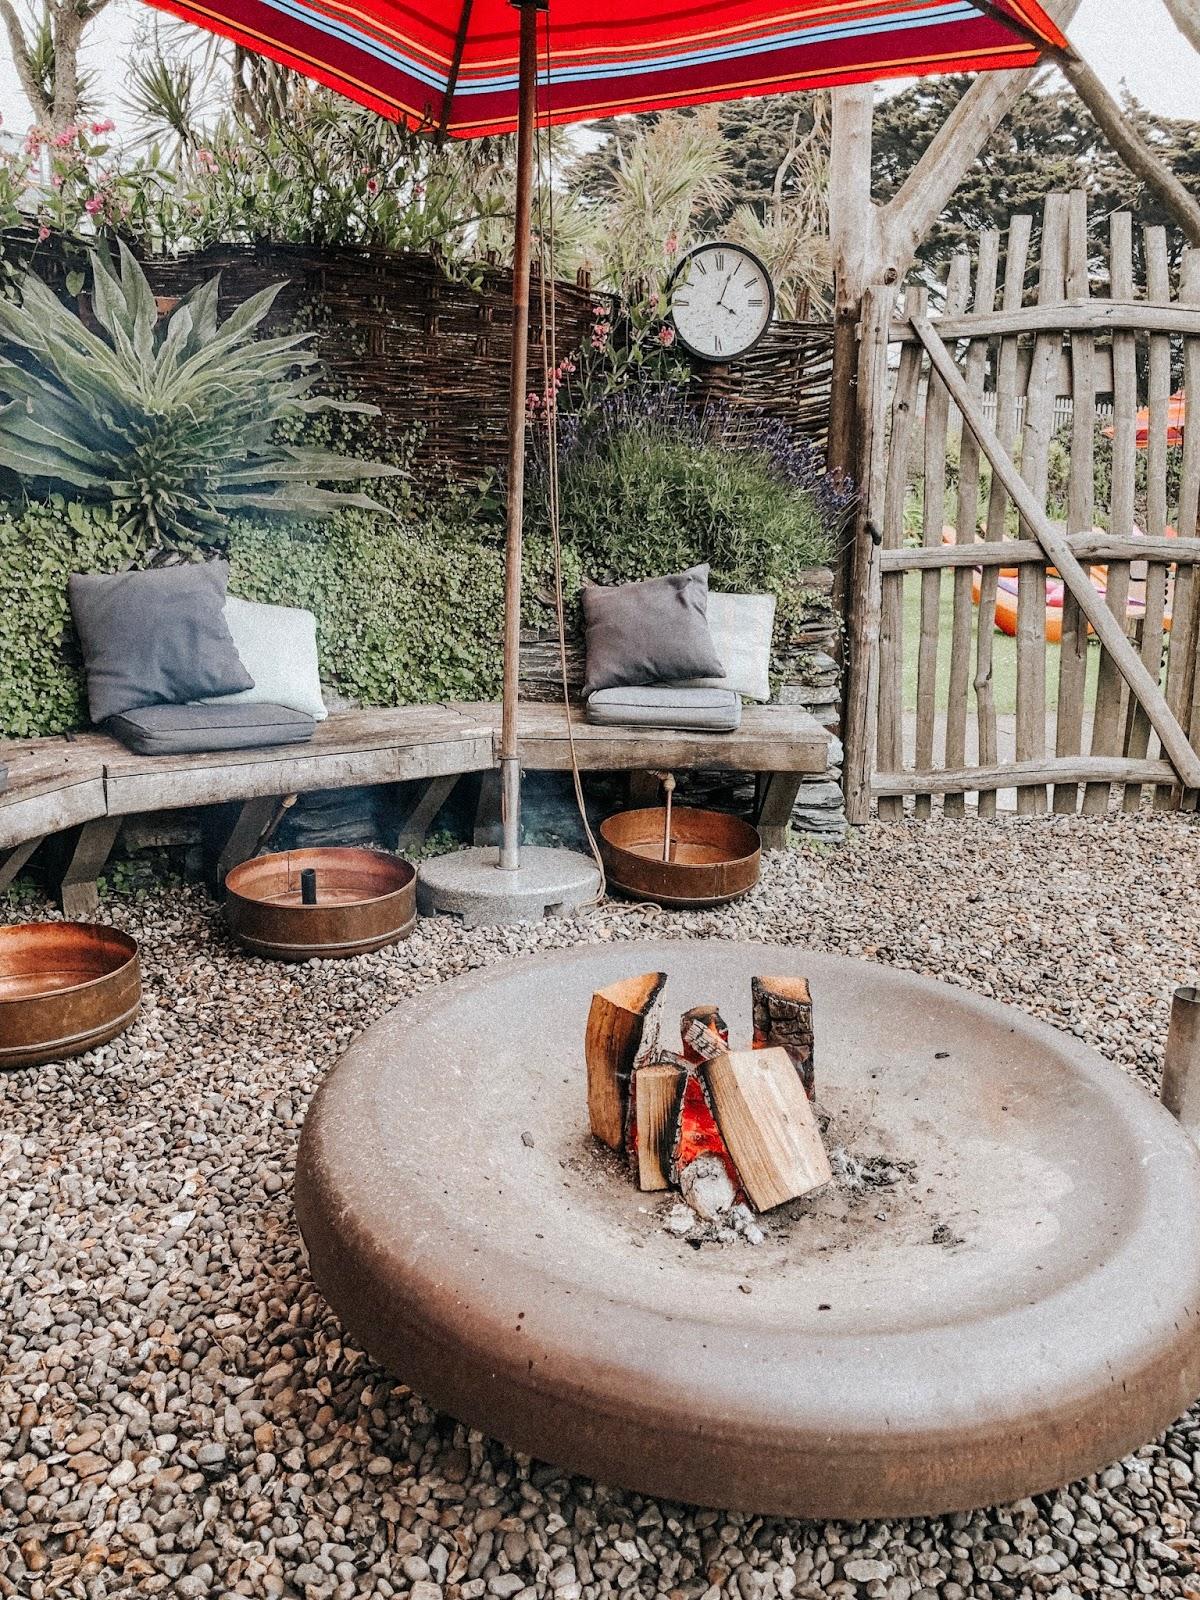 Mawgan Porth Beach, Cornwall Holidays, bedruthan Hotel & Spa, luxury stay cornwall, family holidays cornwall, Sensory Spa Garden